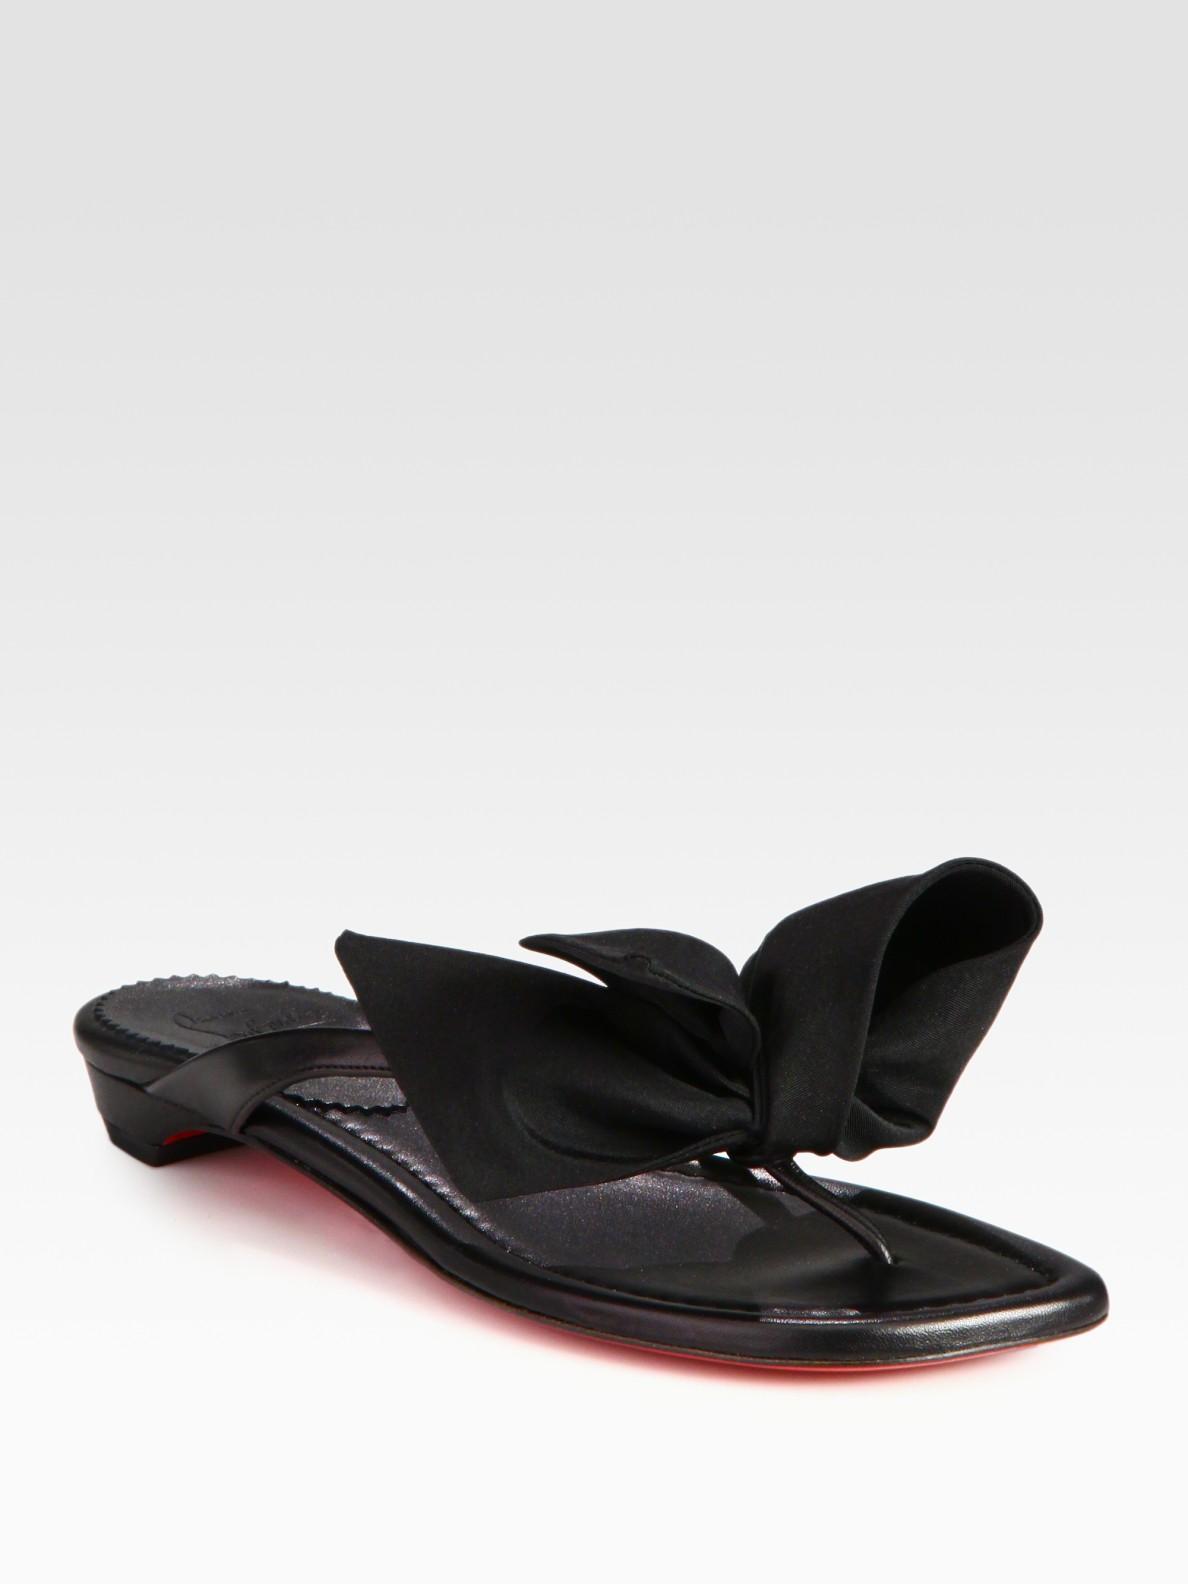 boutin shoes - Artesur ? christian louboutin thong slide sandals